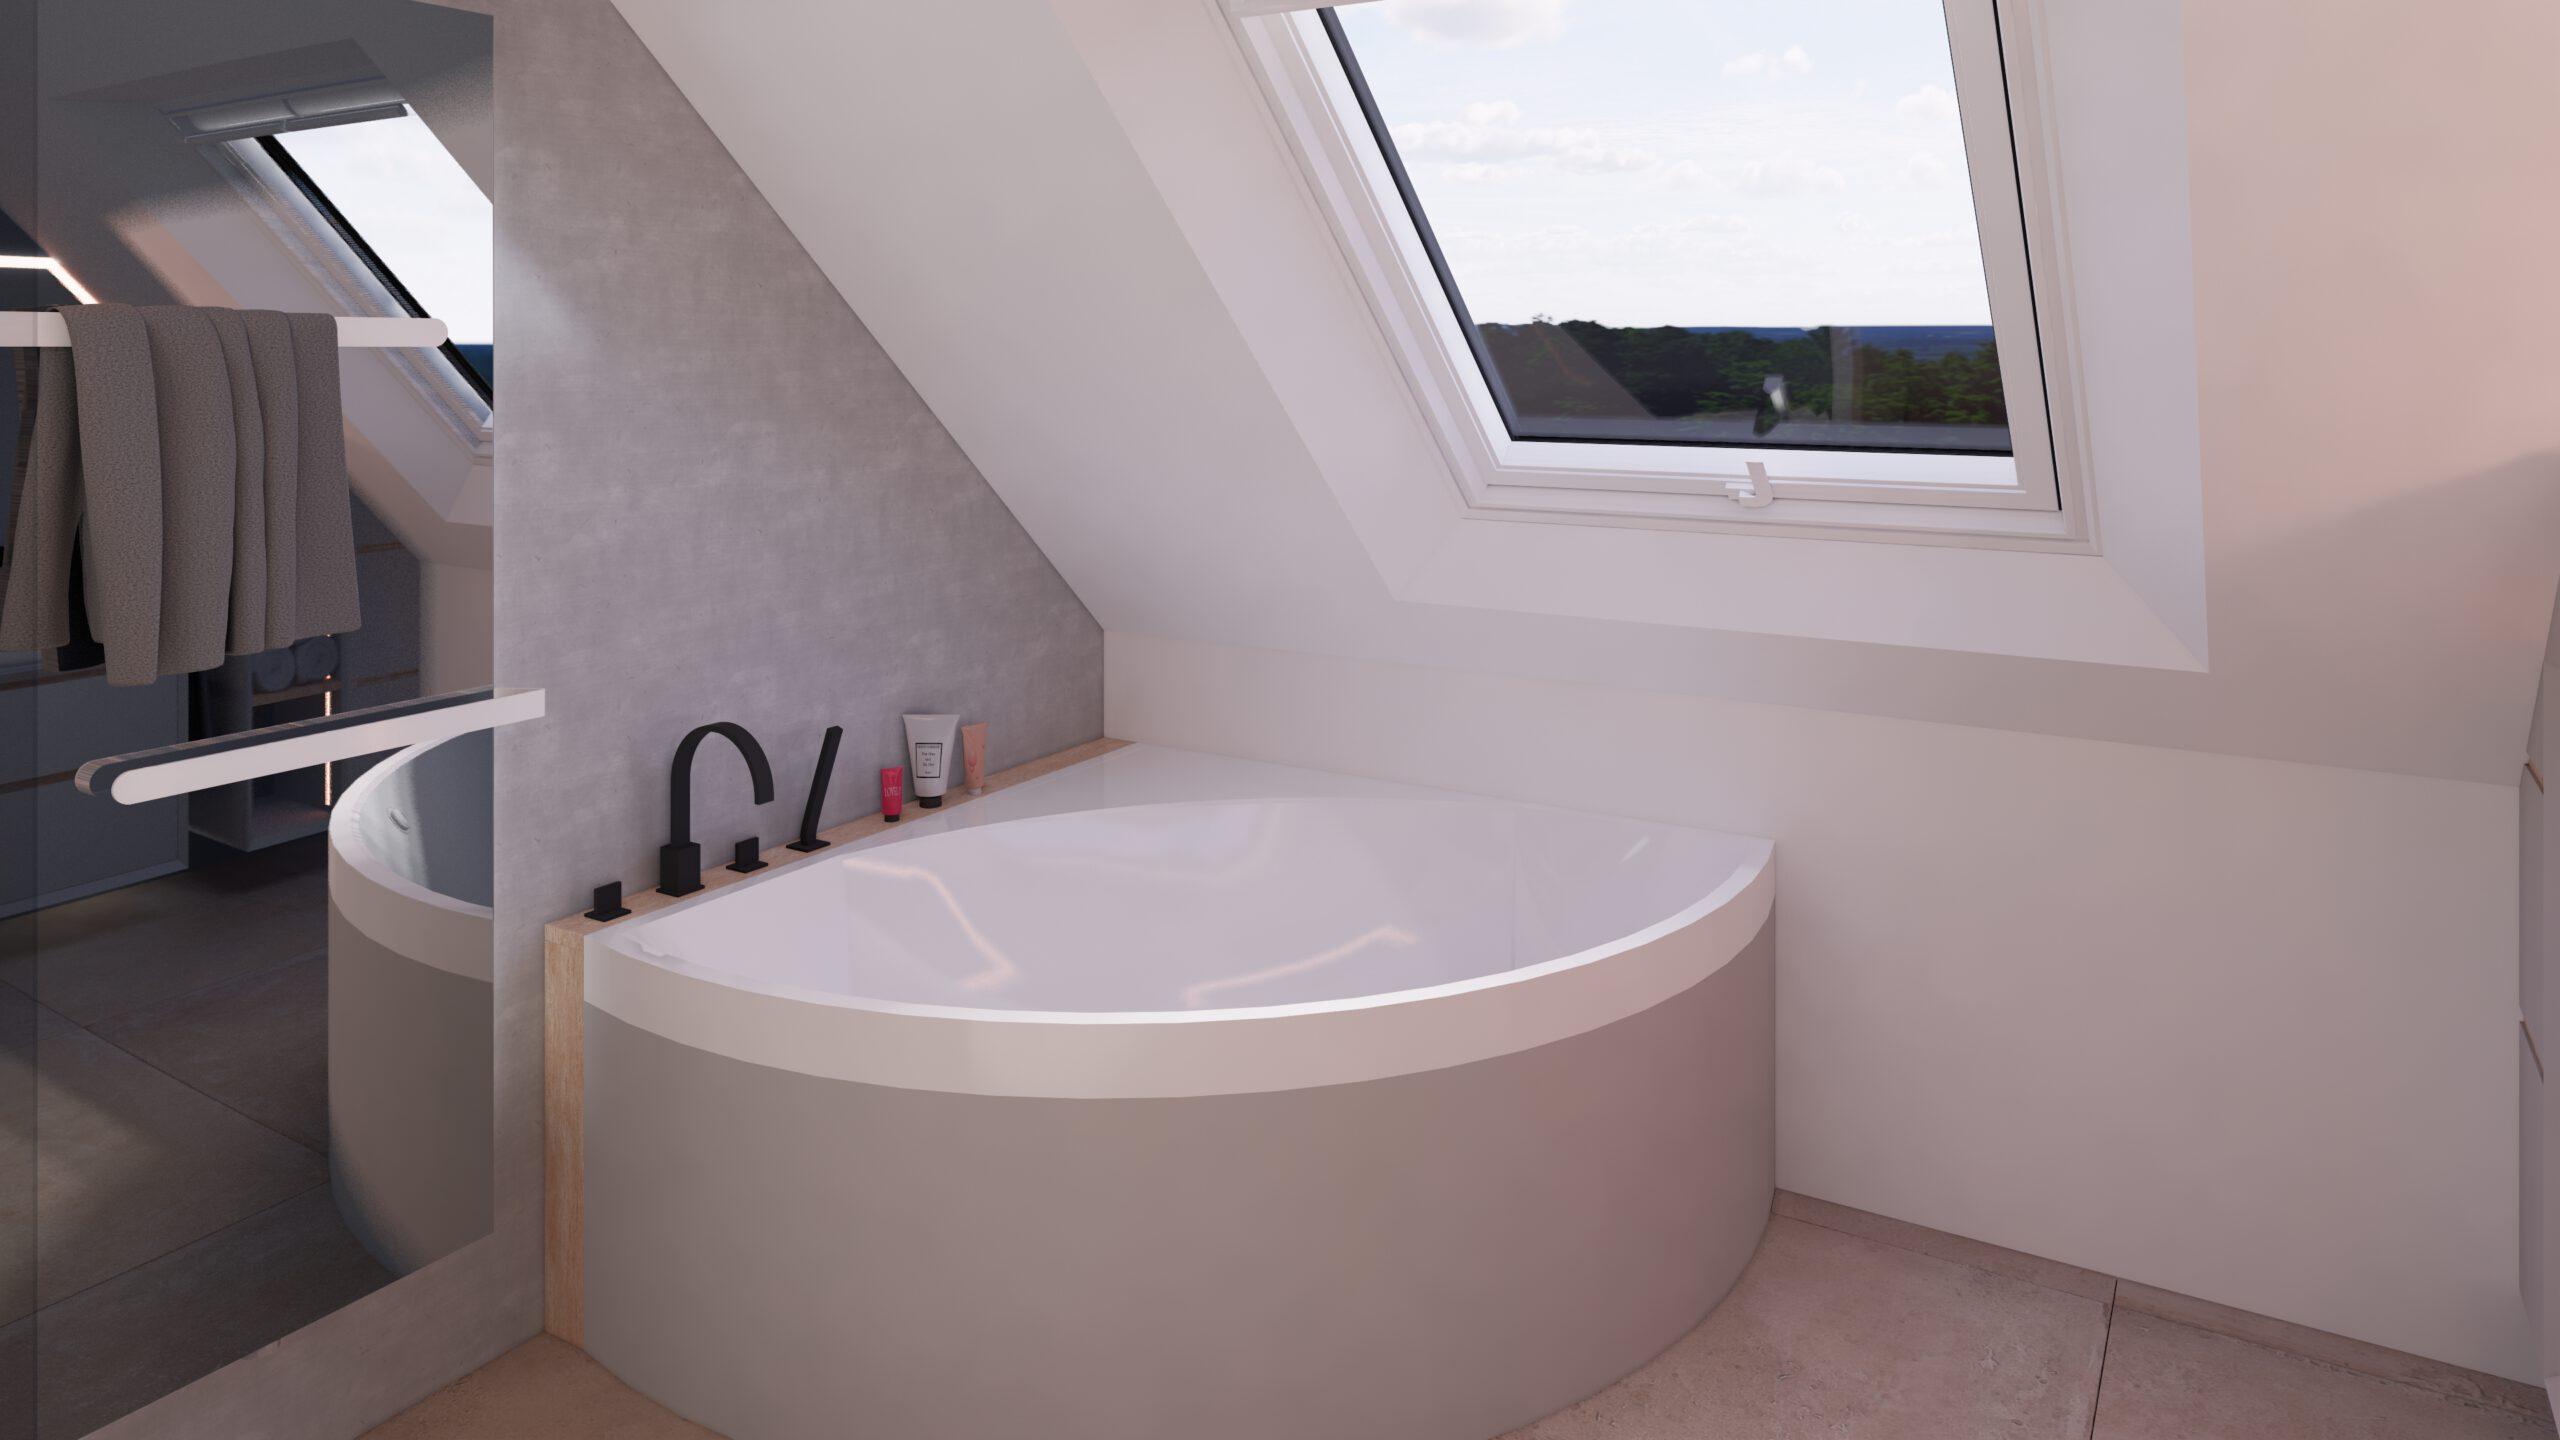 Badewanne, Eckbadewanne, Fenster